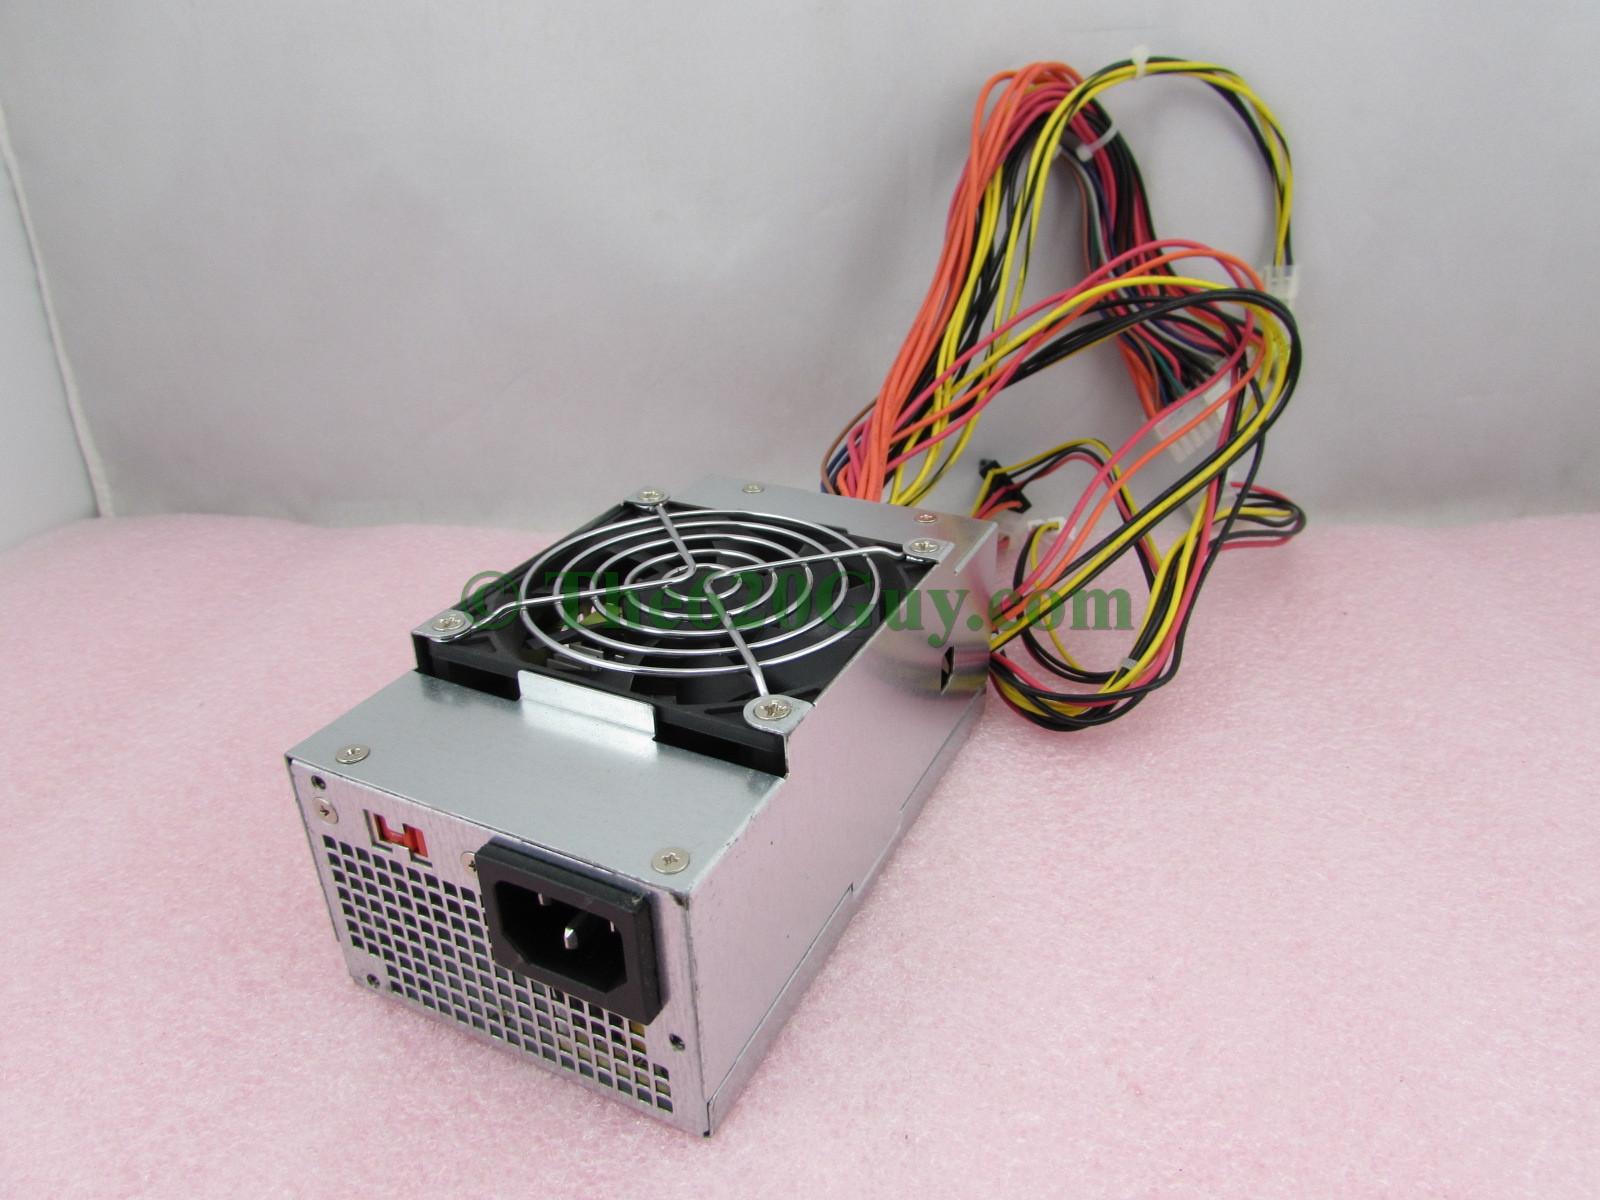 Allied SL-275TFX 275W TFX ATX12V Slim Switching Desktop Power Supply AL130XD